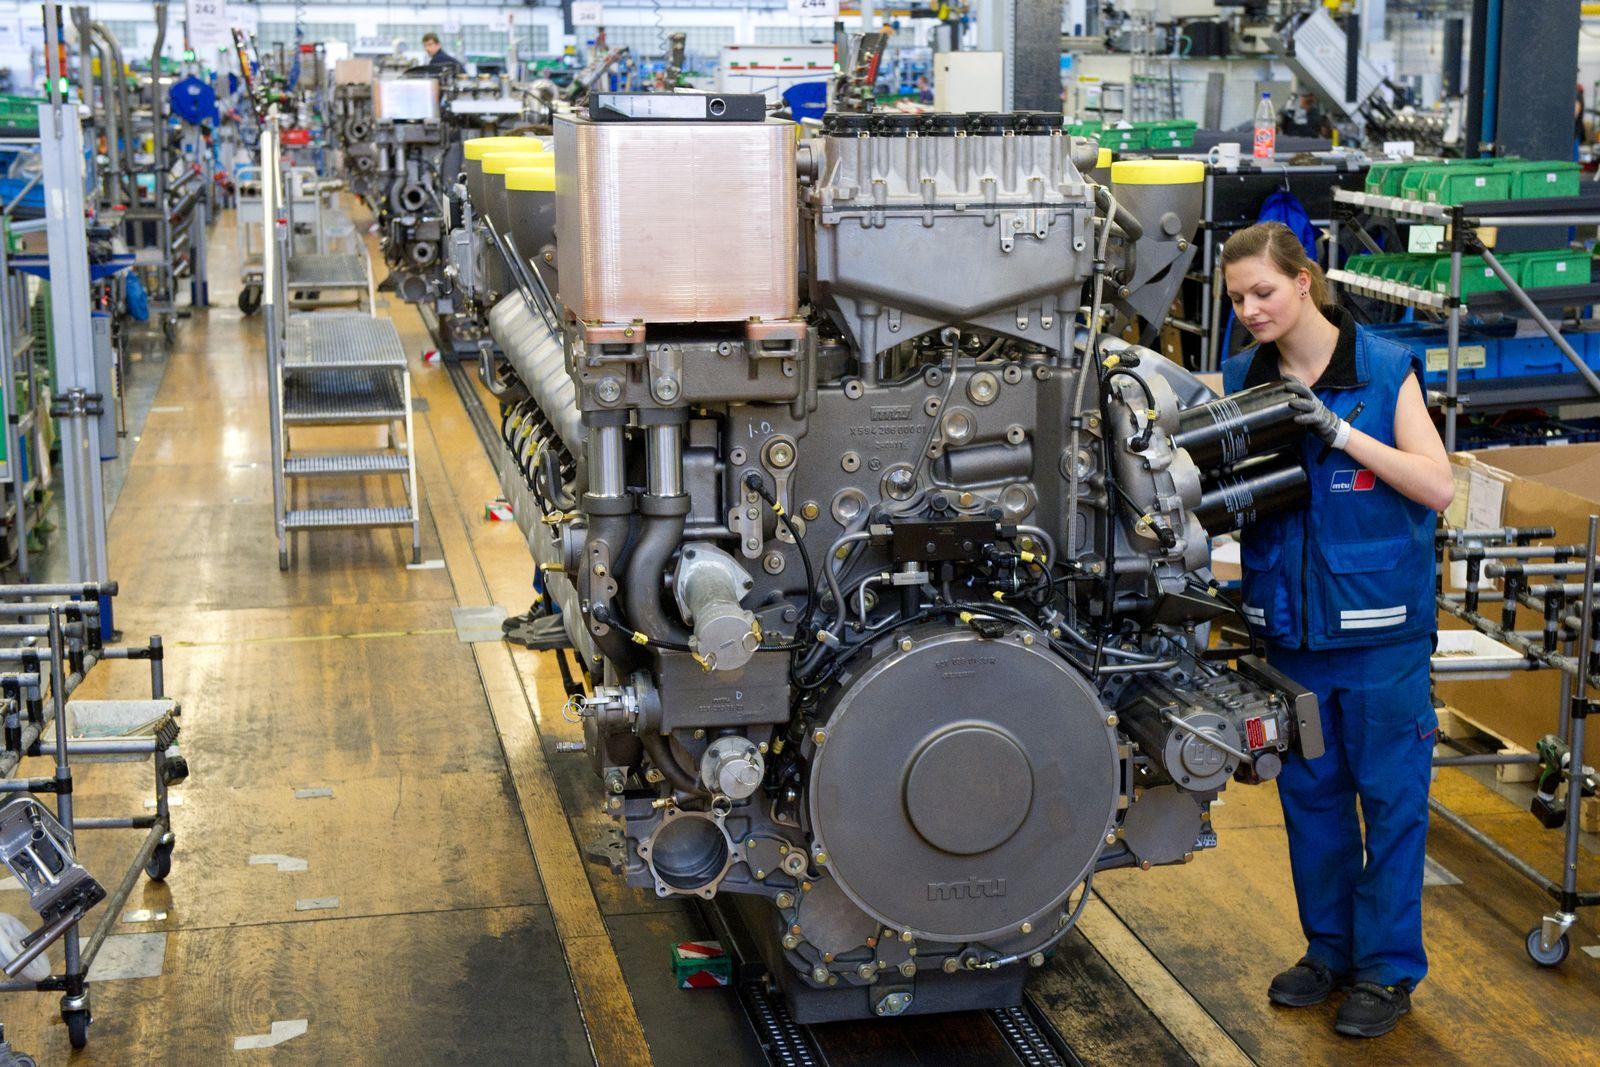 mmo Thema: Industrie / Maschinenbau